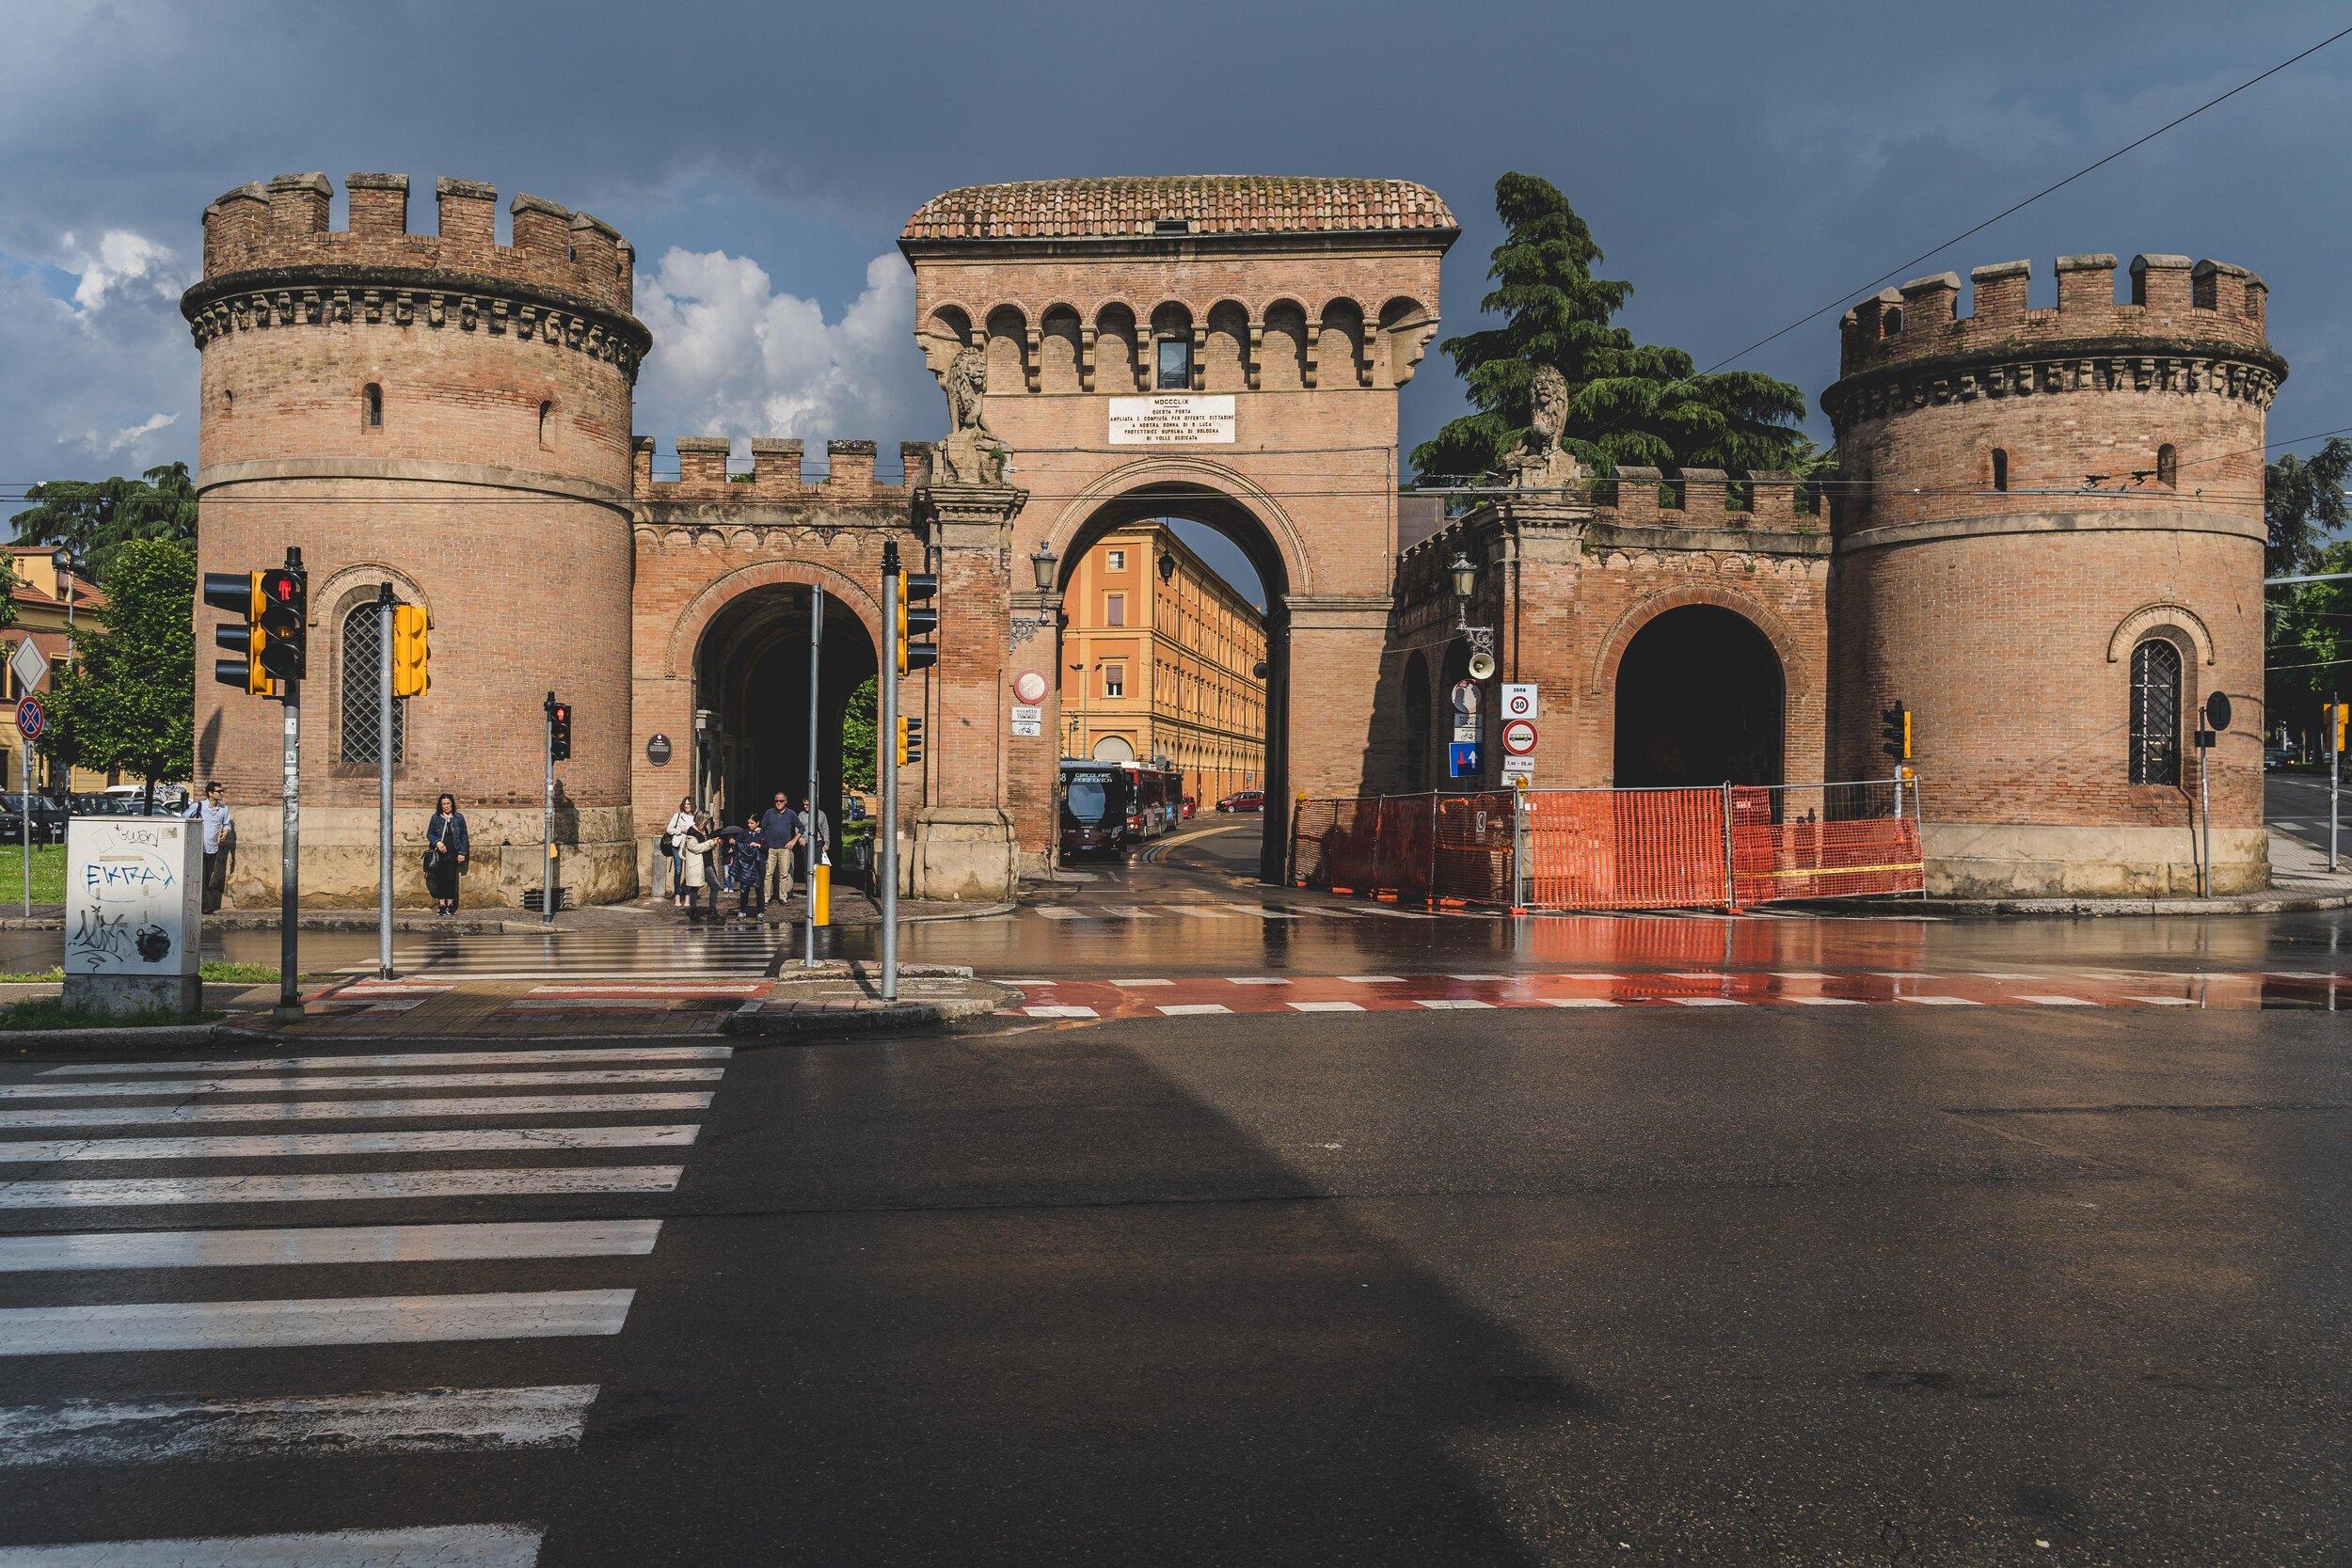 Porta Saragozza bologna city gate.jpg